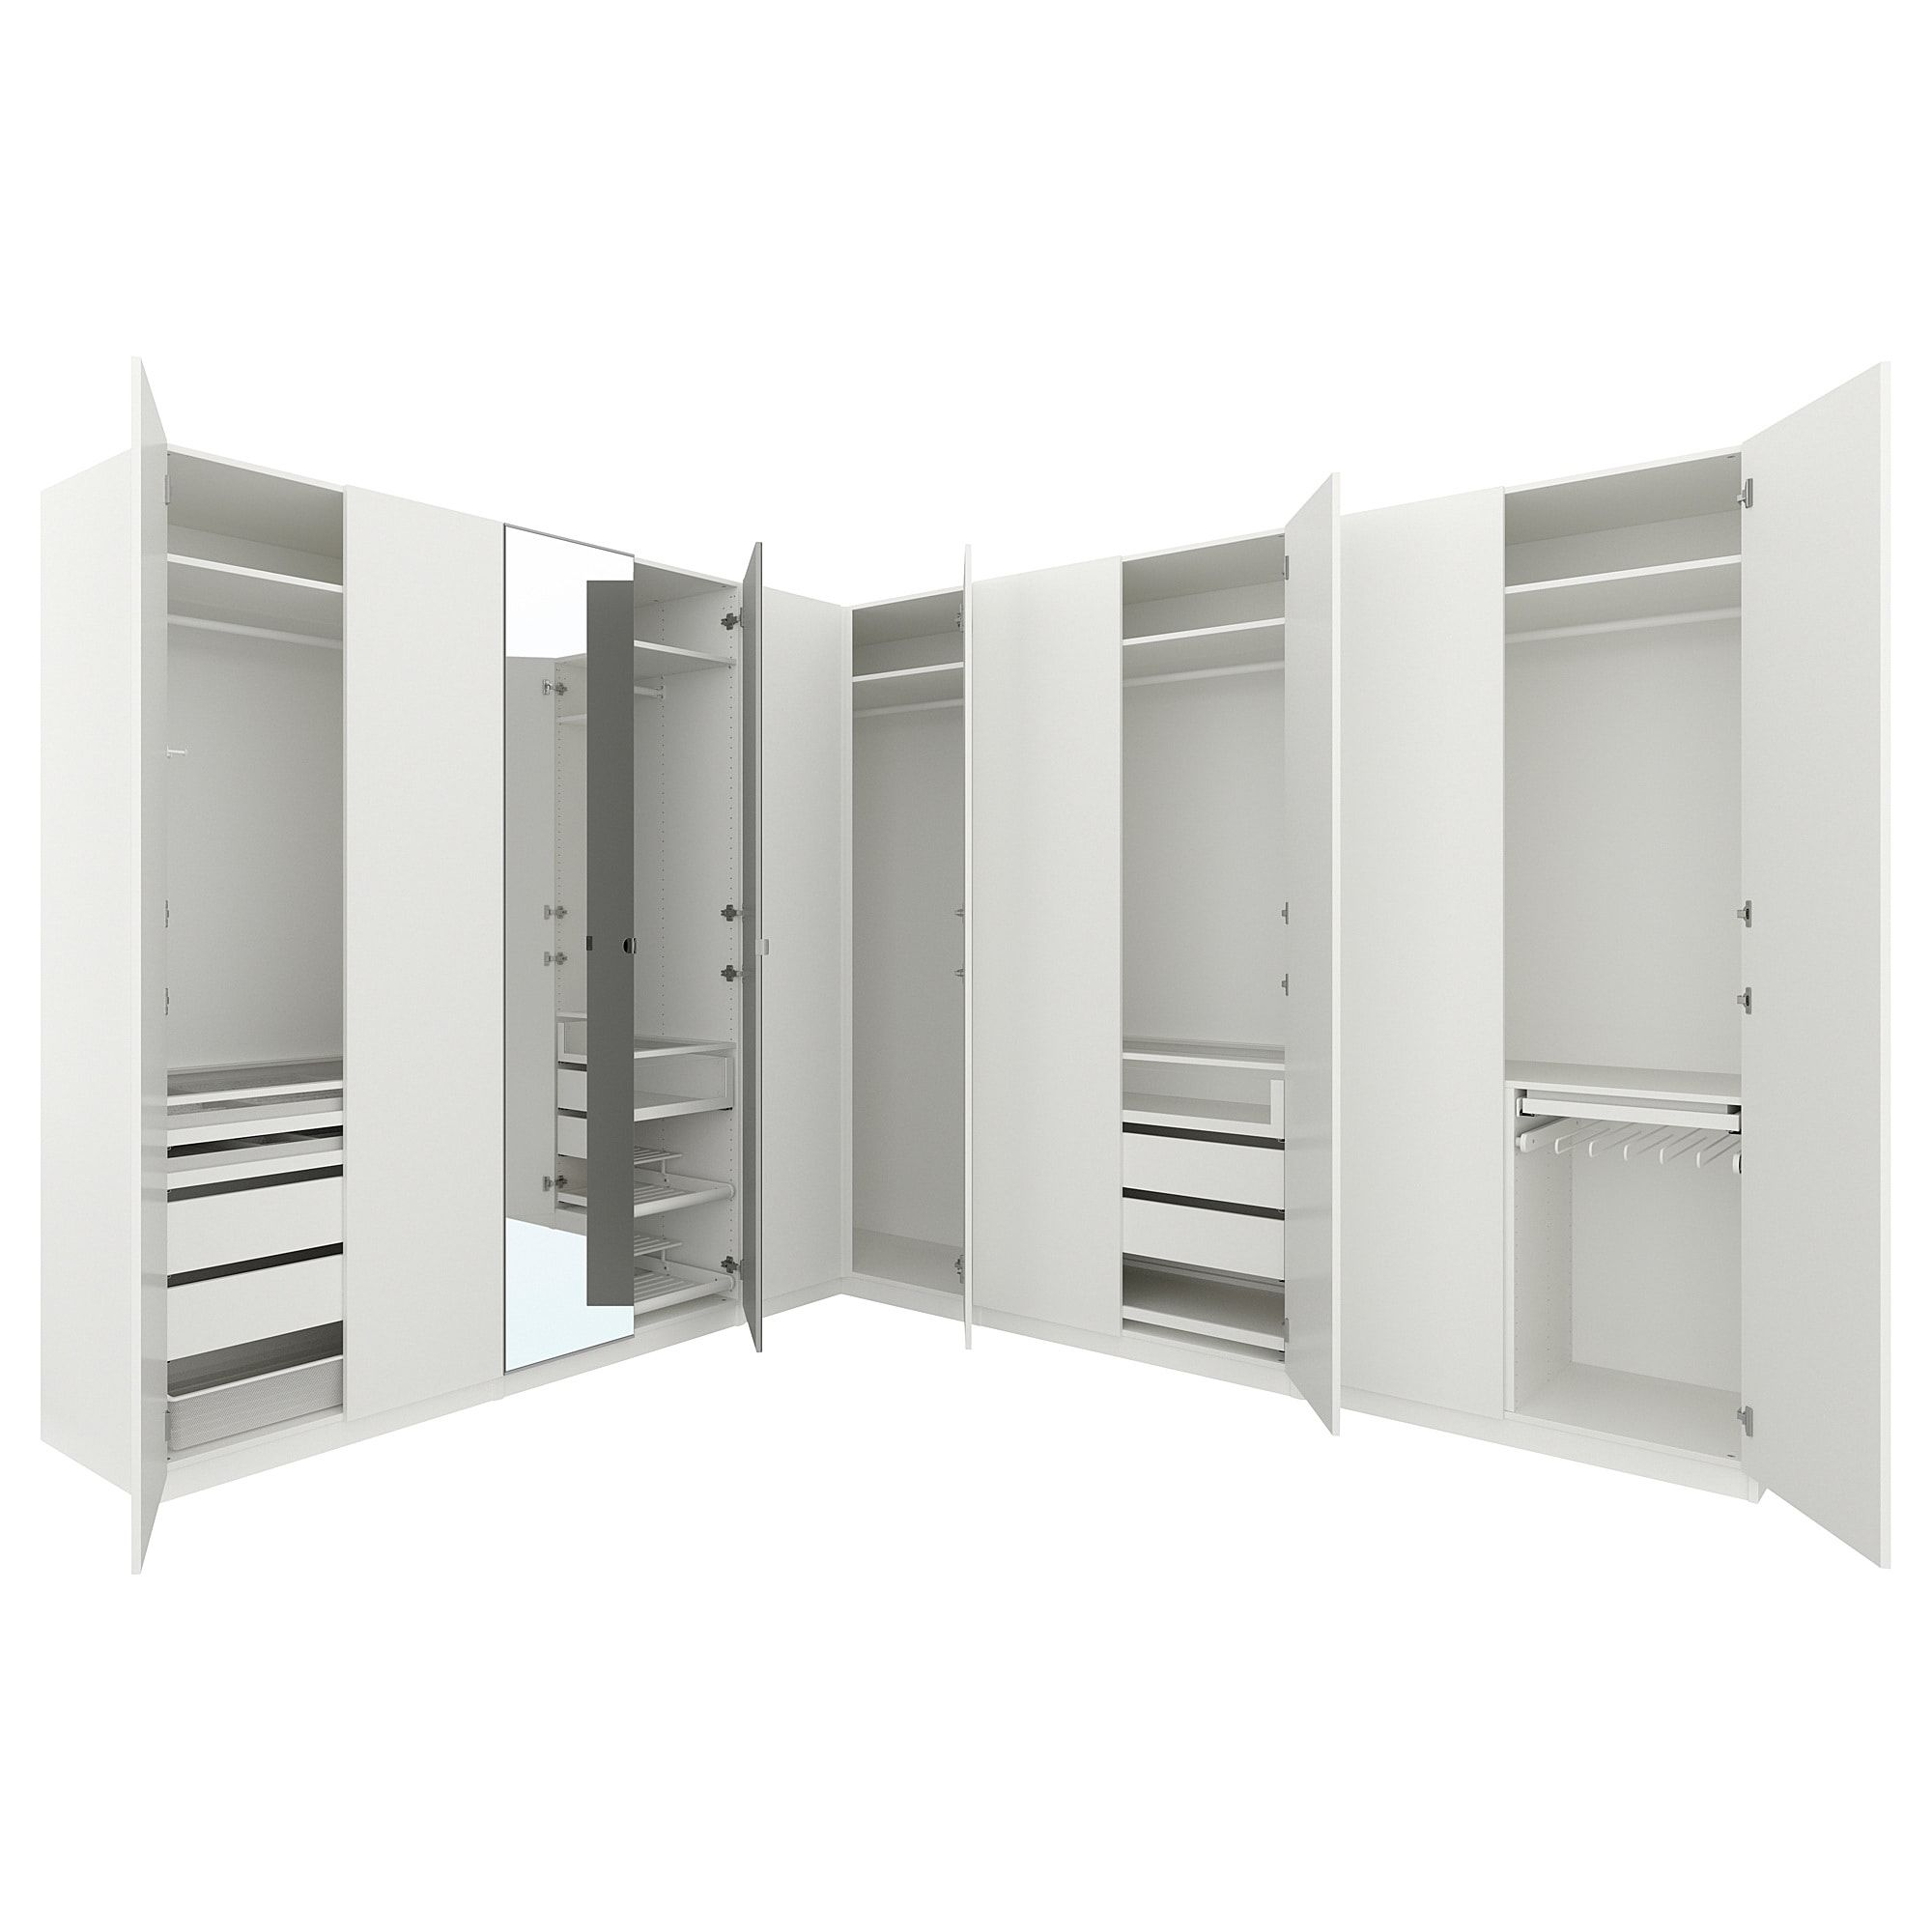 PAX Corner wardrobe white, Forsand Vikedal 122/122x93 1